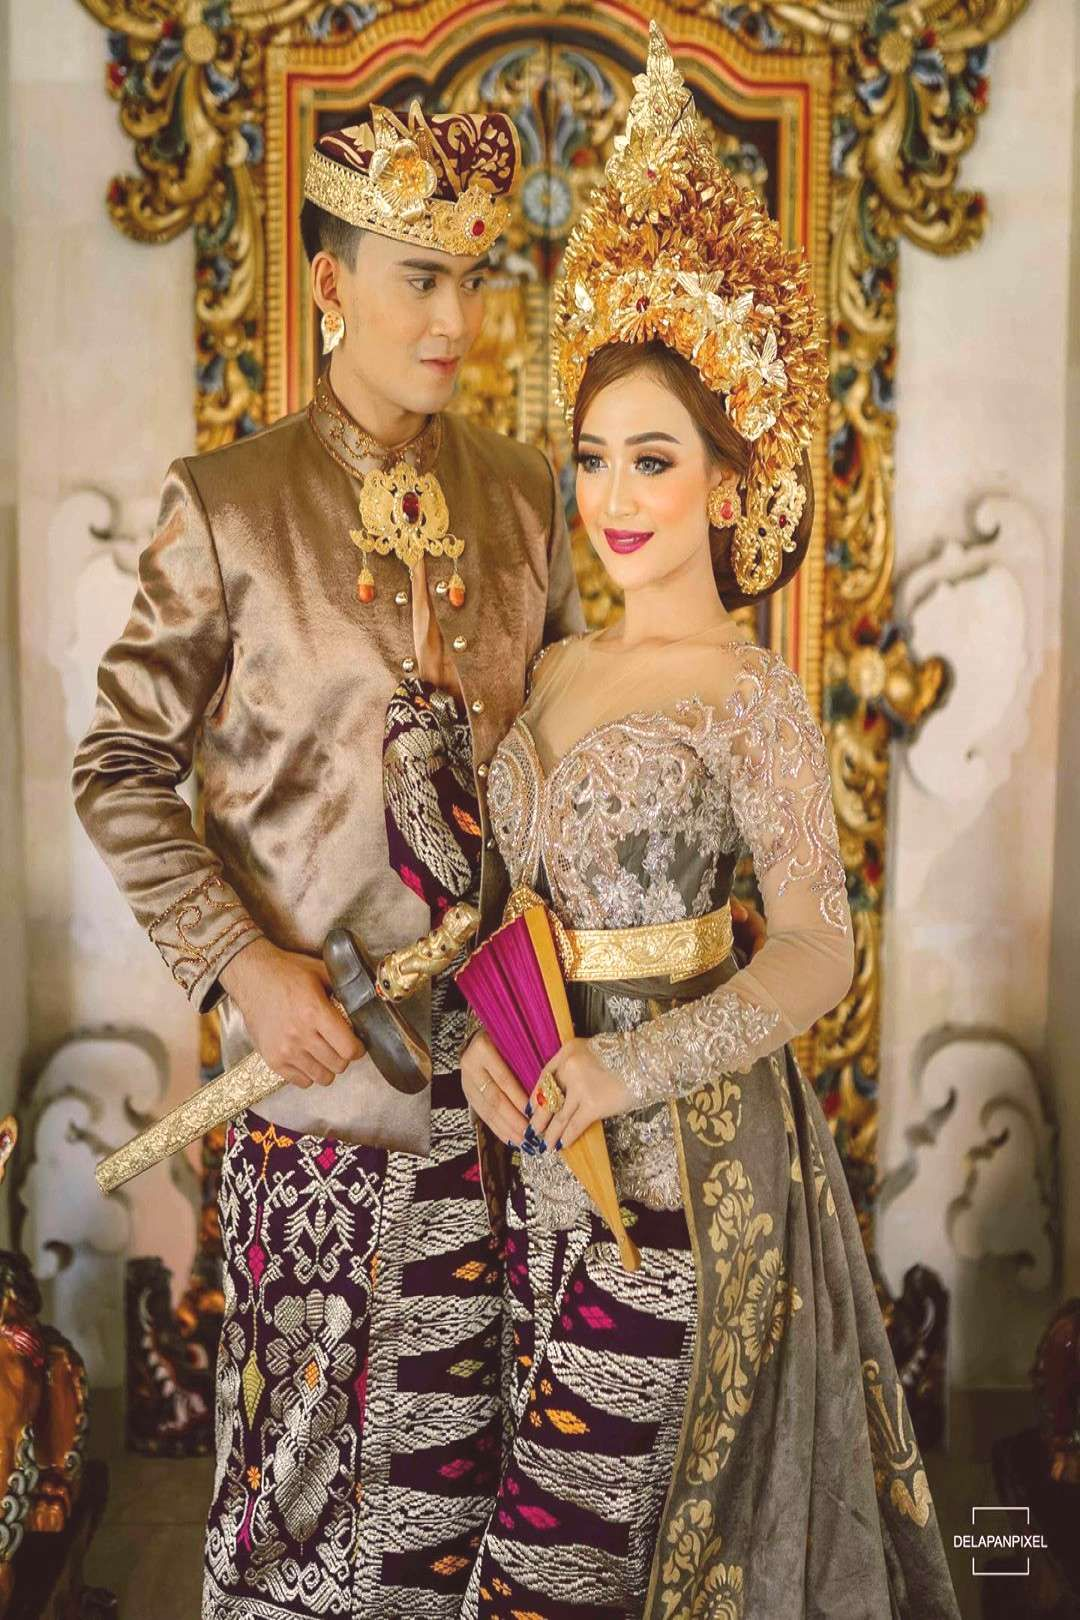 Pricelist Wardrobe Lainnya Silahka Lokasi People Untuk Dari Info New Dan 2 New Wardrobe Dari Lokasi Untu In 2020 Indonesian Wedding Fashion Victorian Dress